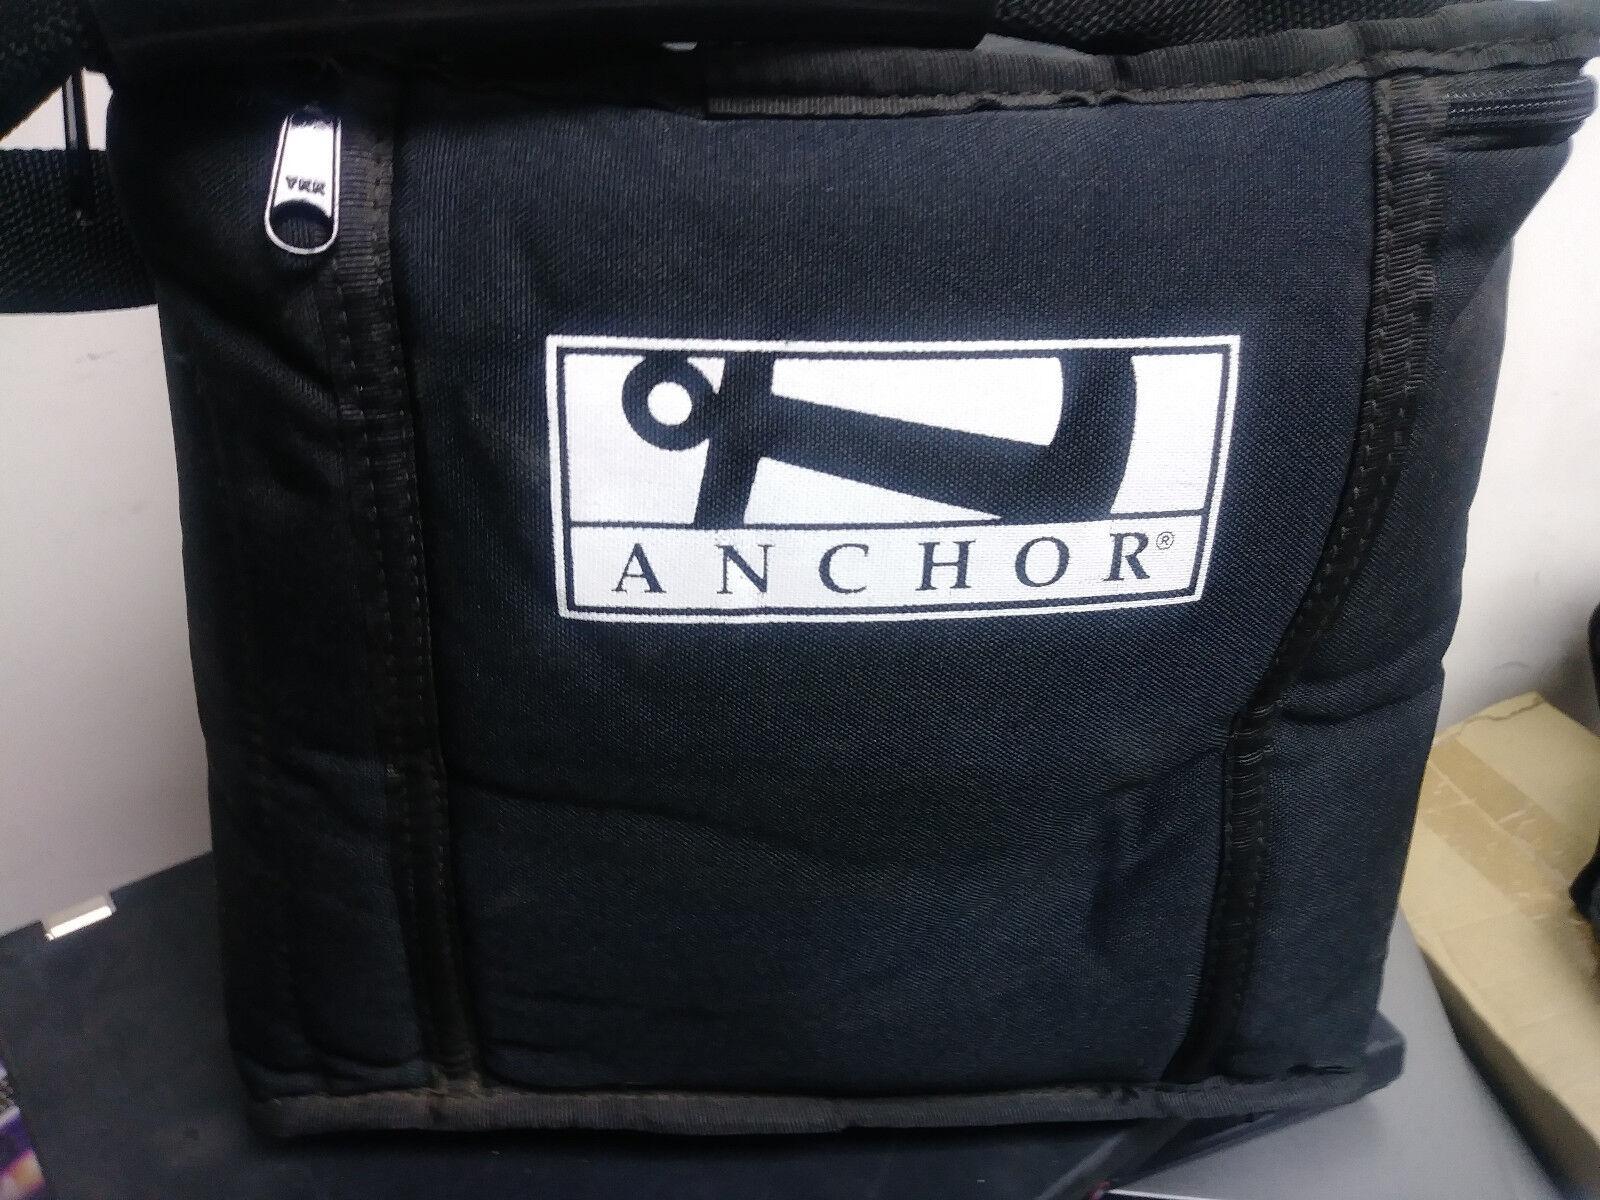 Anchor AN-130-U1, W  UT-18 TRANSMITTER, LM-60 Wireless Mic. & Remote Control